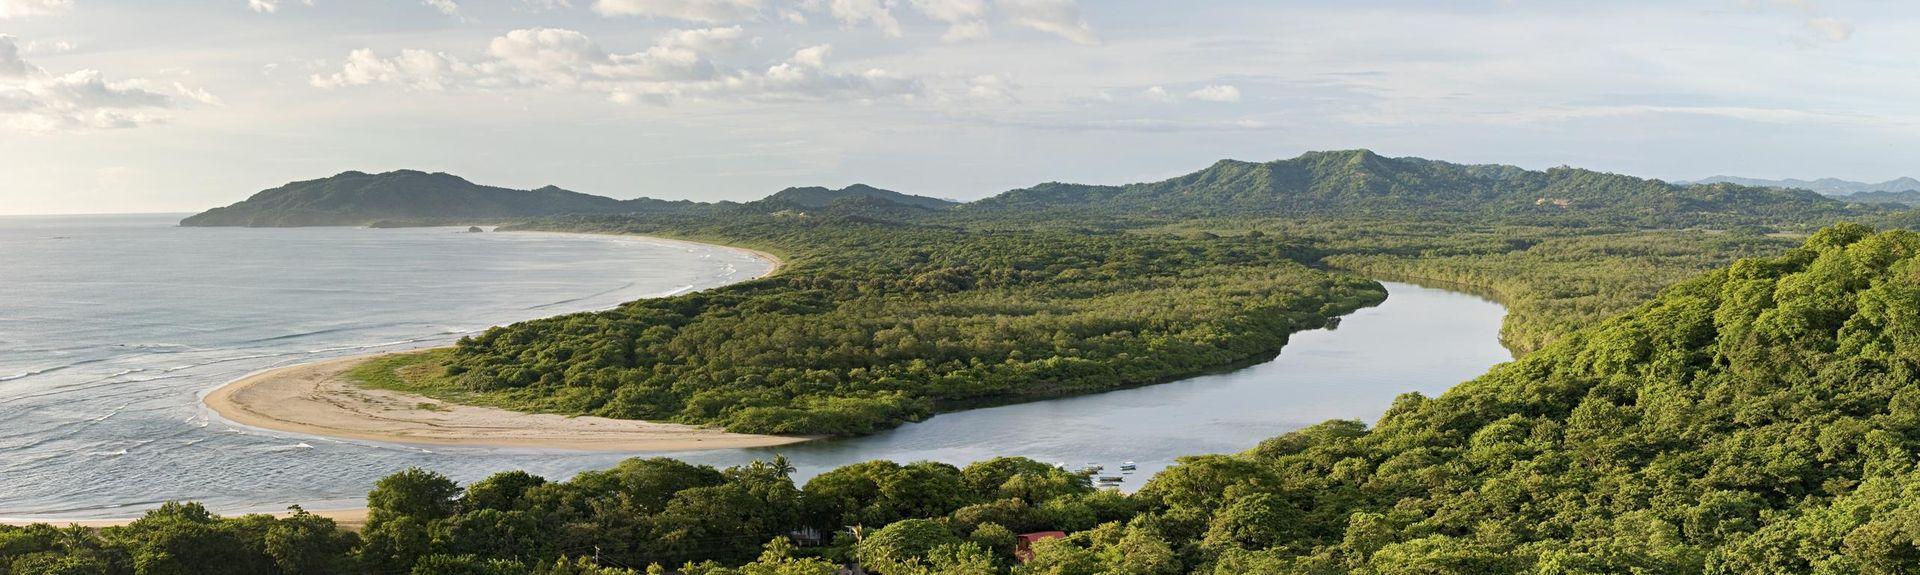 Tamarindo Diria (Tamarindo, Guanacaste, Costa Rica)